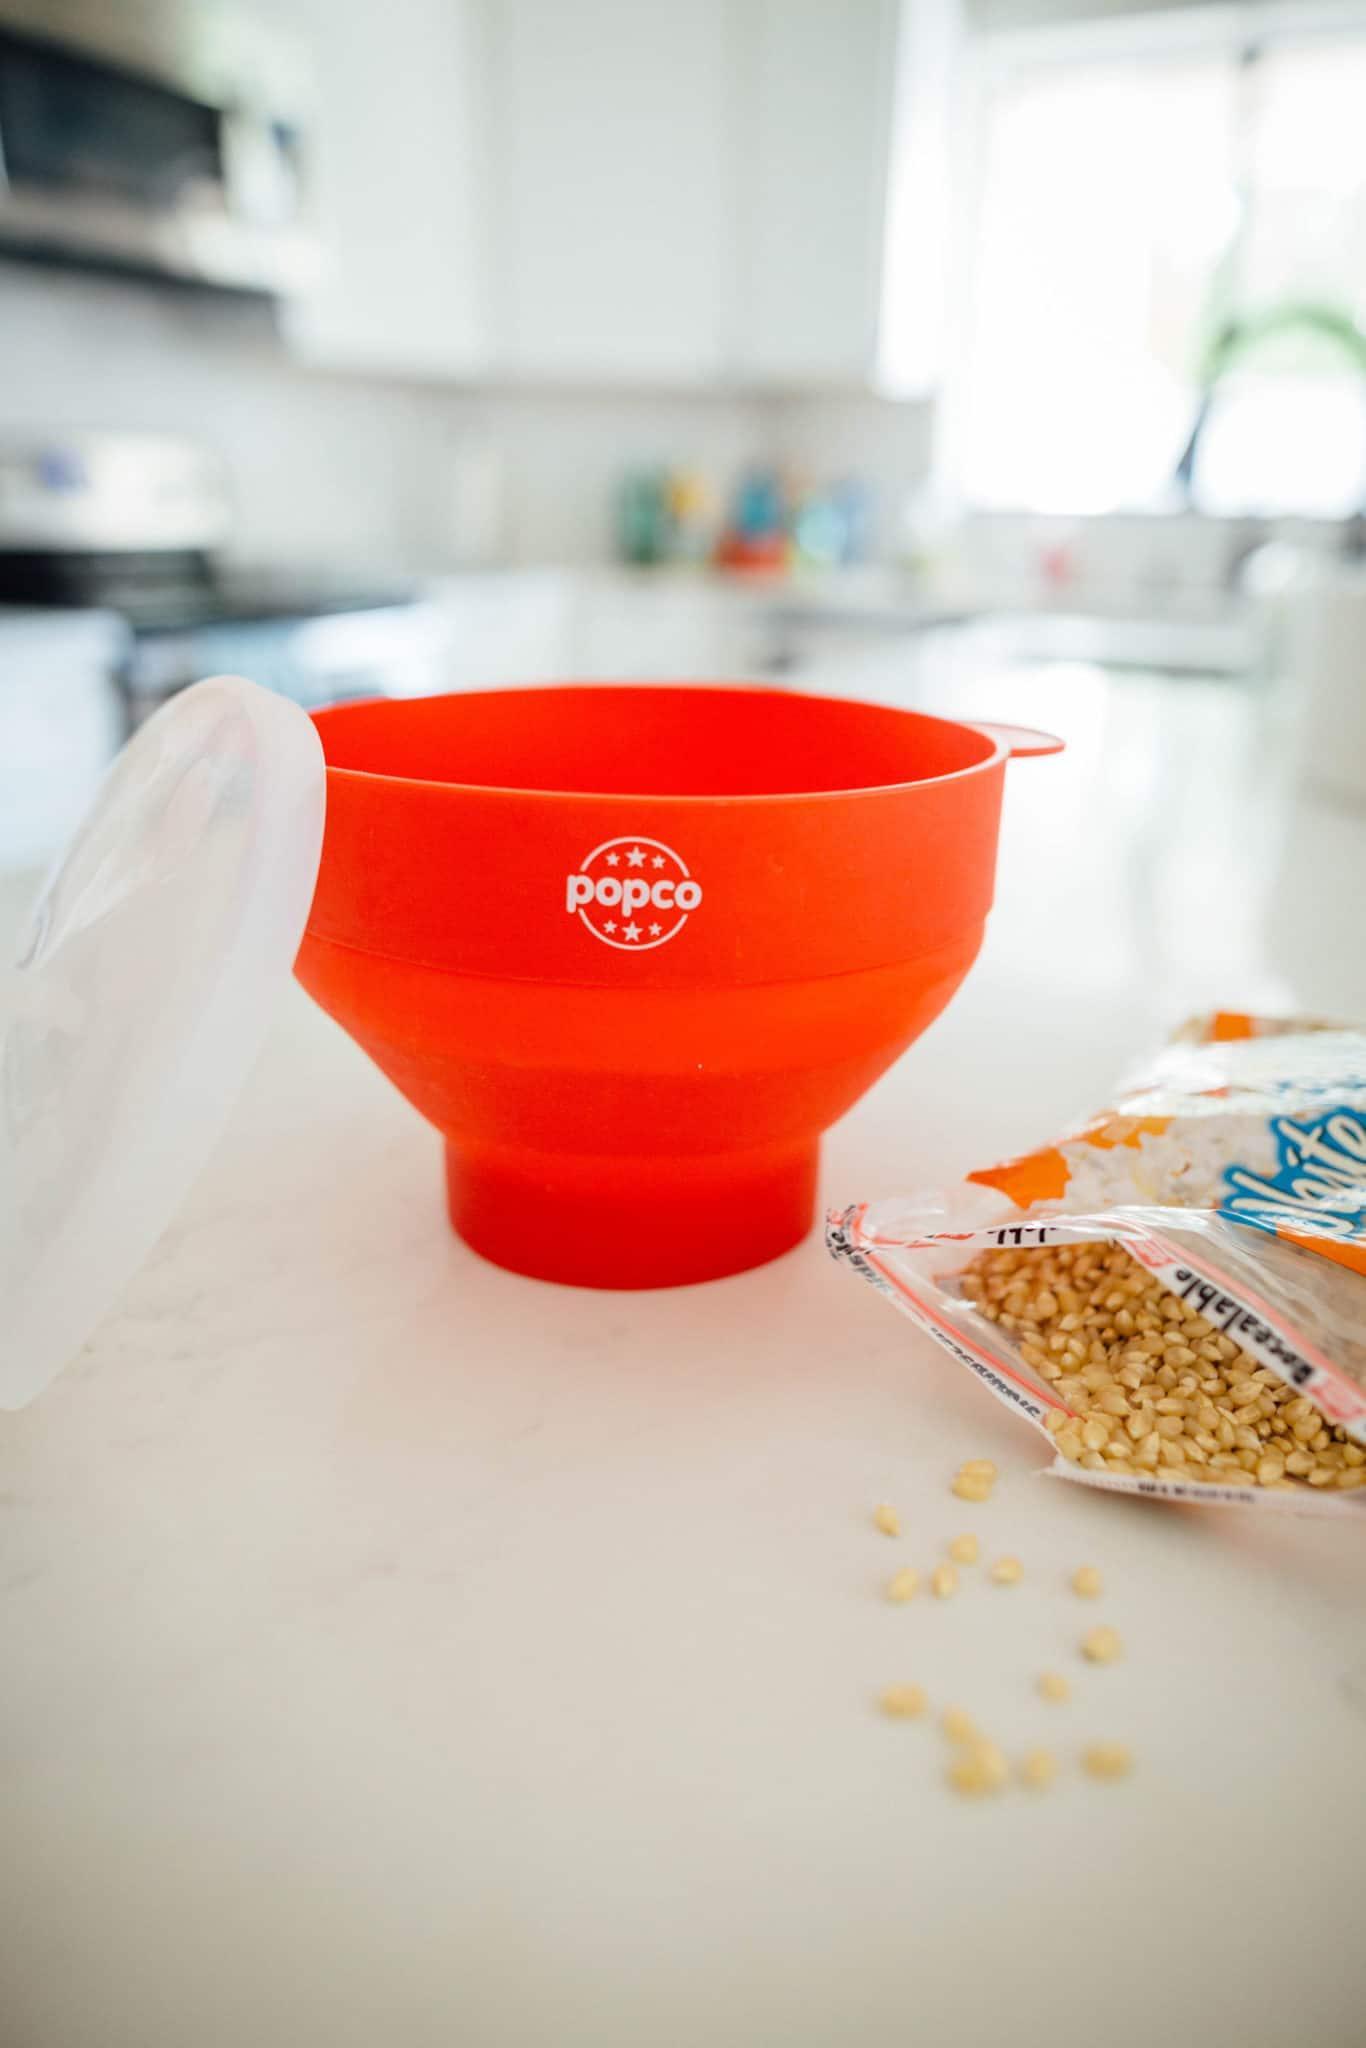 Collapsable Popco Silicone Microwave Popcorn Popper